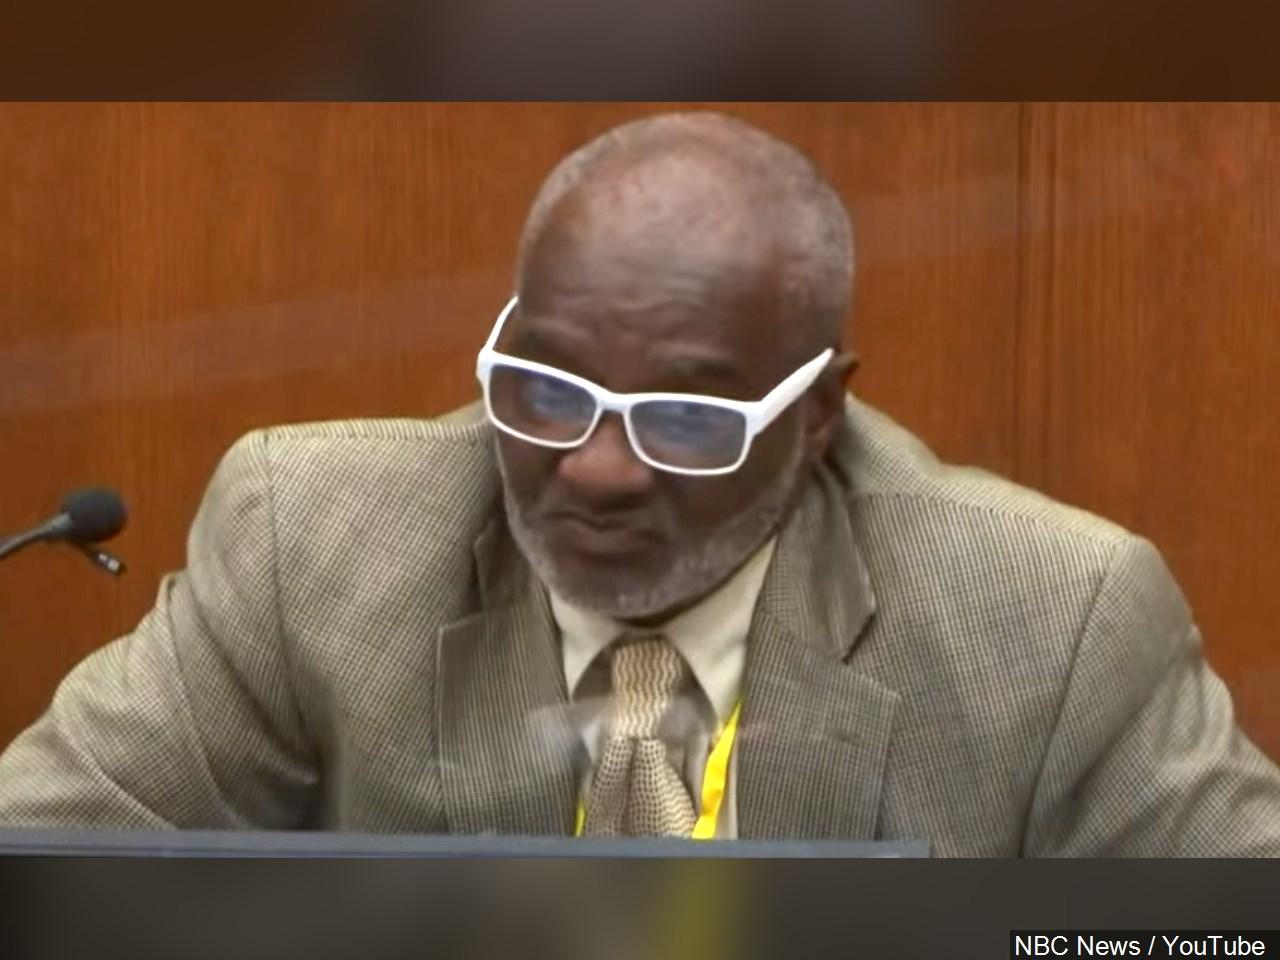 Derek Chauvin is on trial for George Floyd's death